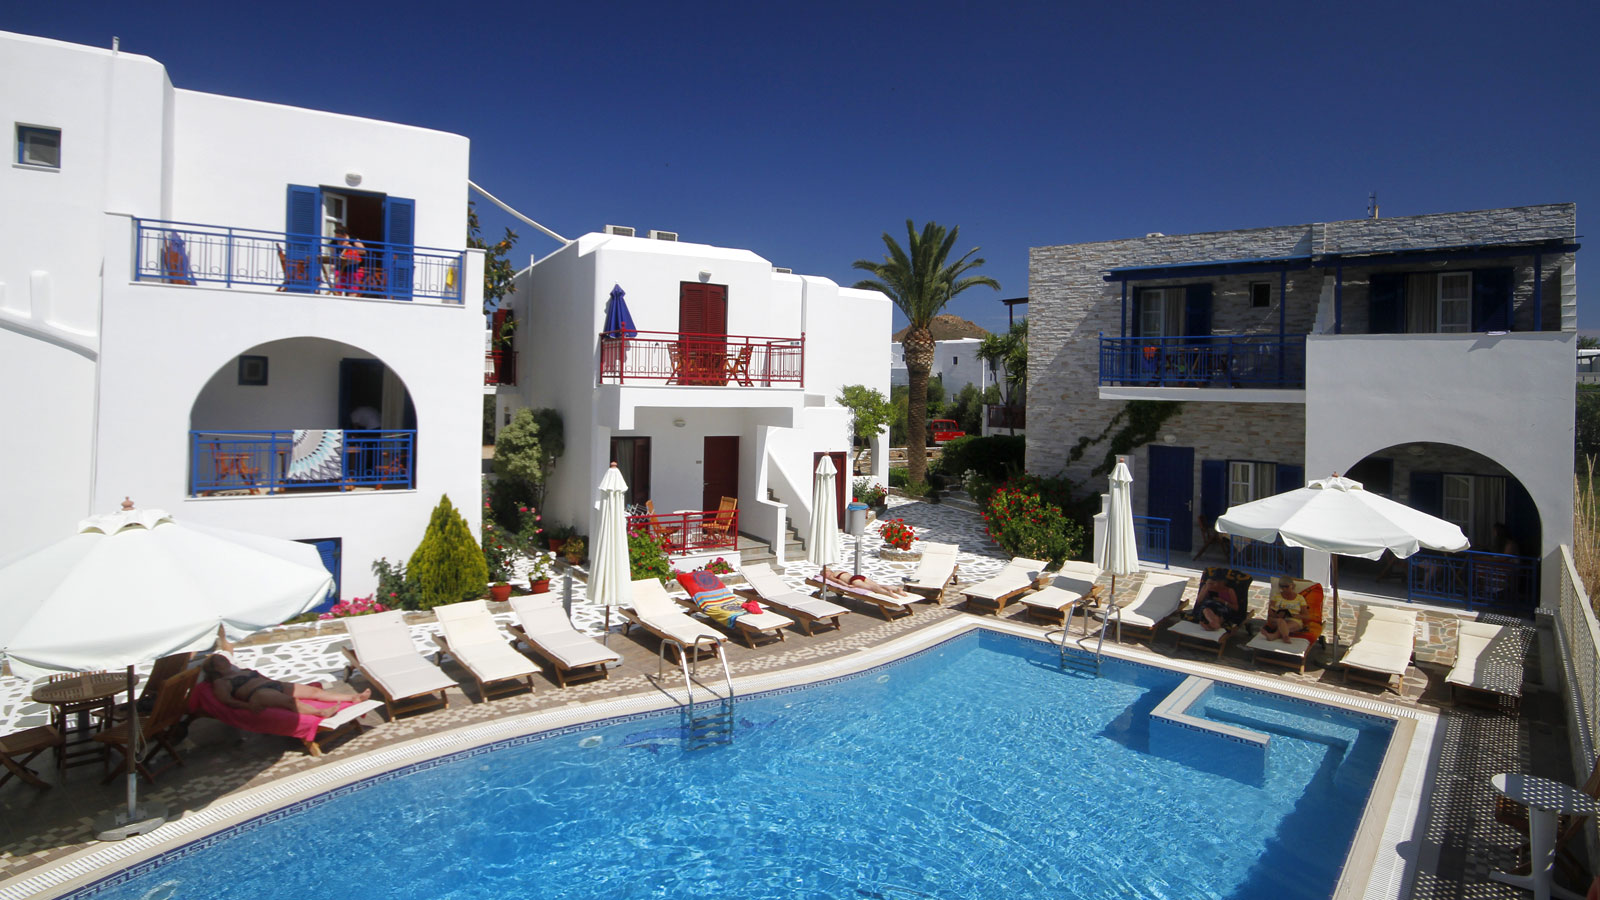 Requests - Hotel Katerina on Naxos Island, Agios Prokopios